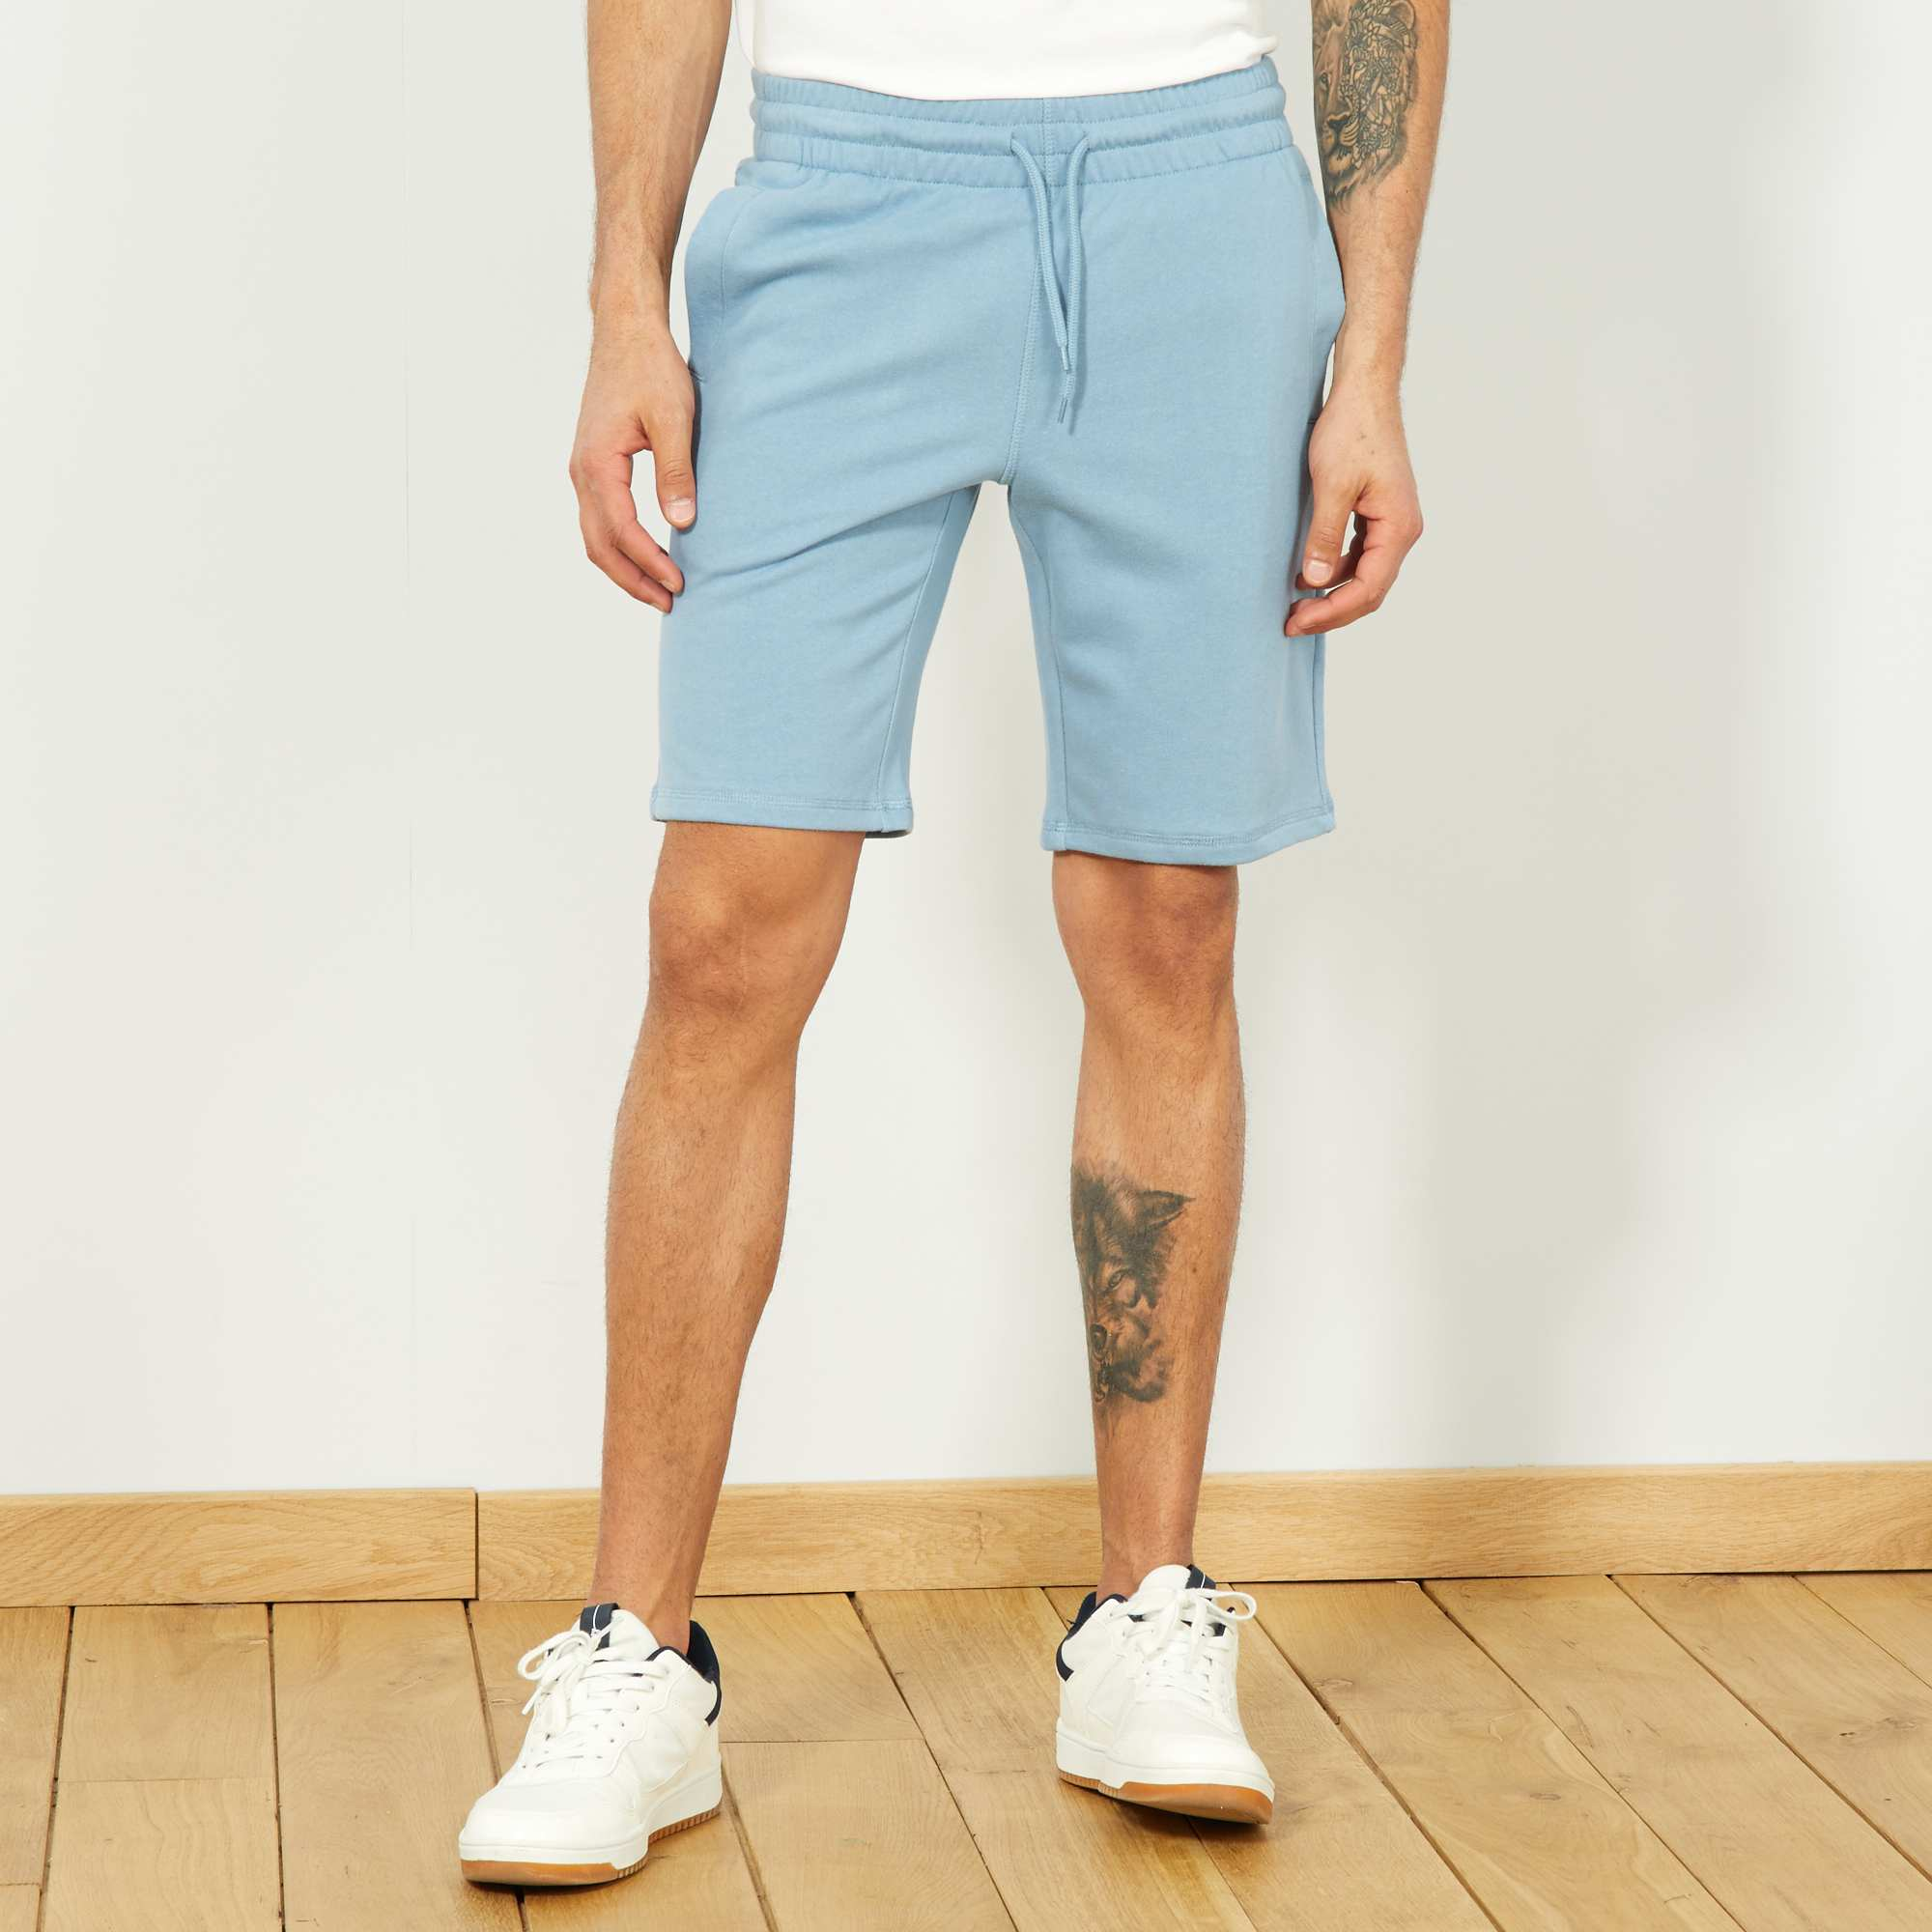 5984f440370 Pantalón corto deportivo de felpa Hombre - azul gris pala - Kiabi ...